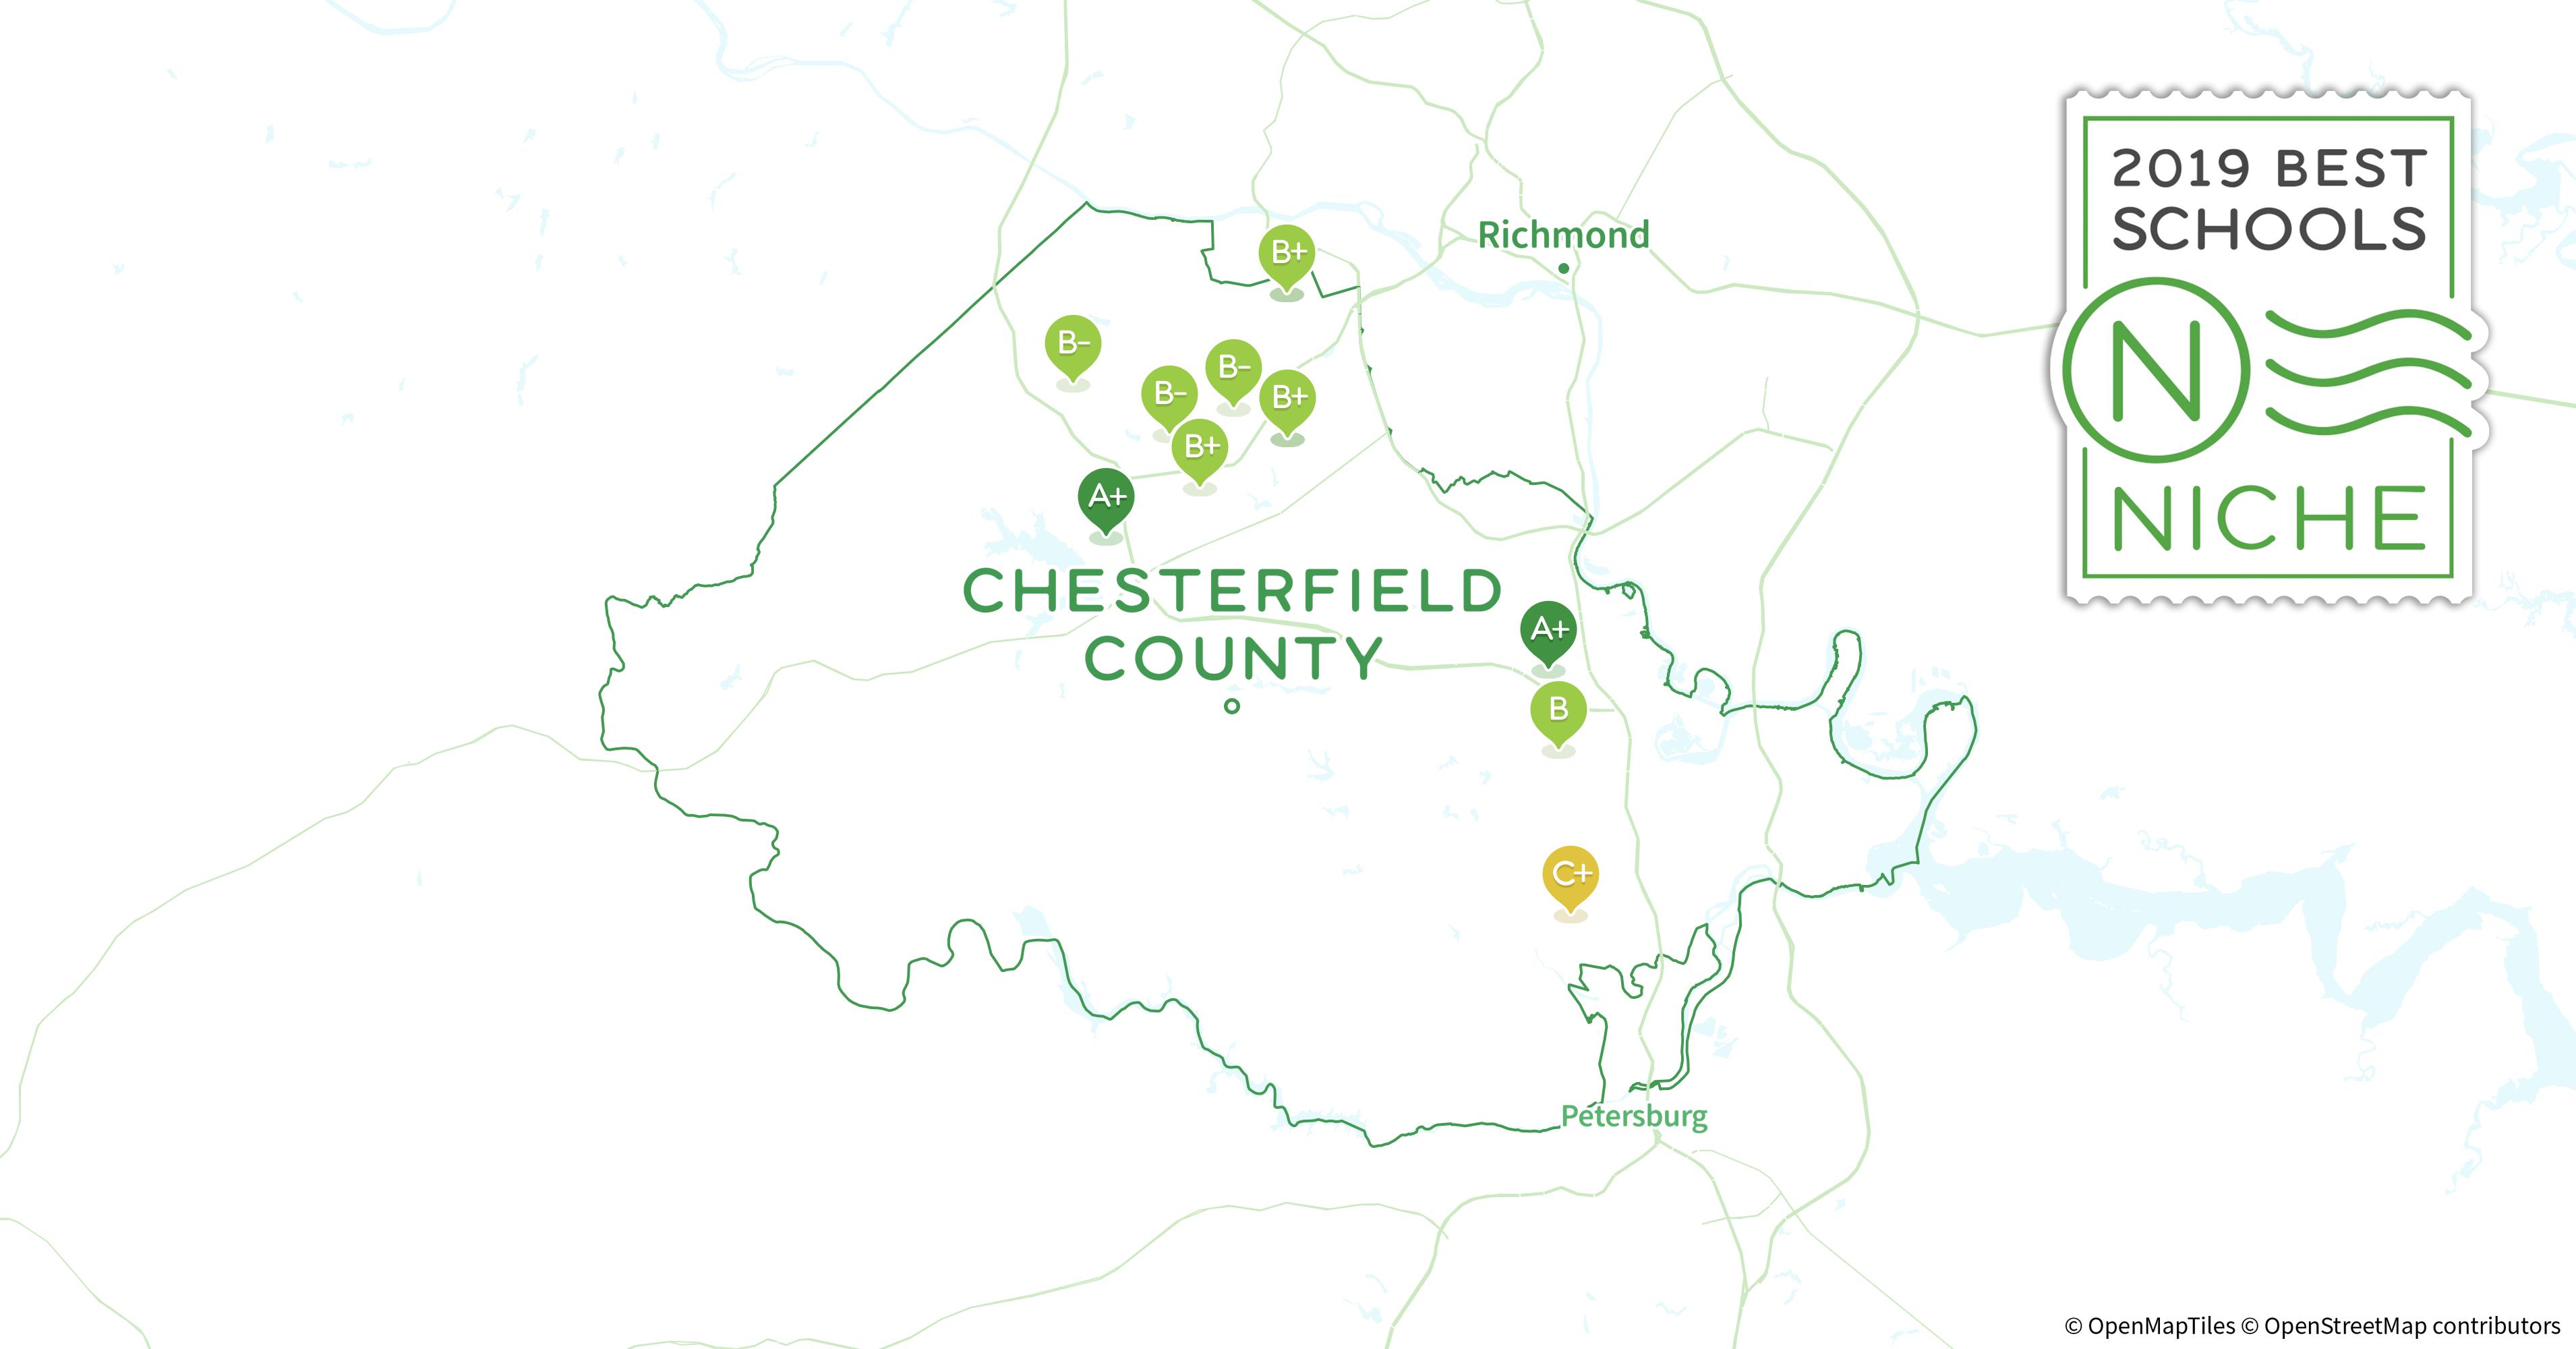 2019 Best Public High Schools In Chesterfield County Va Niche